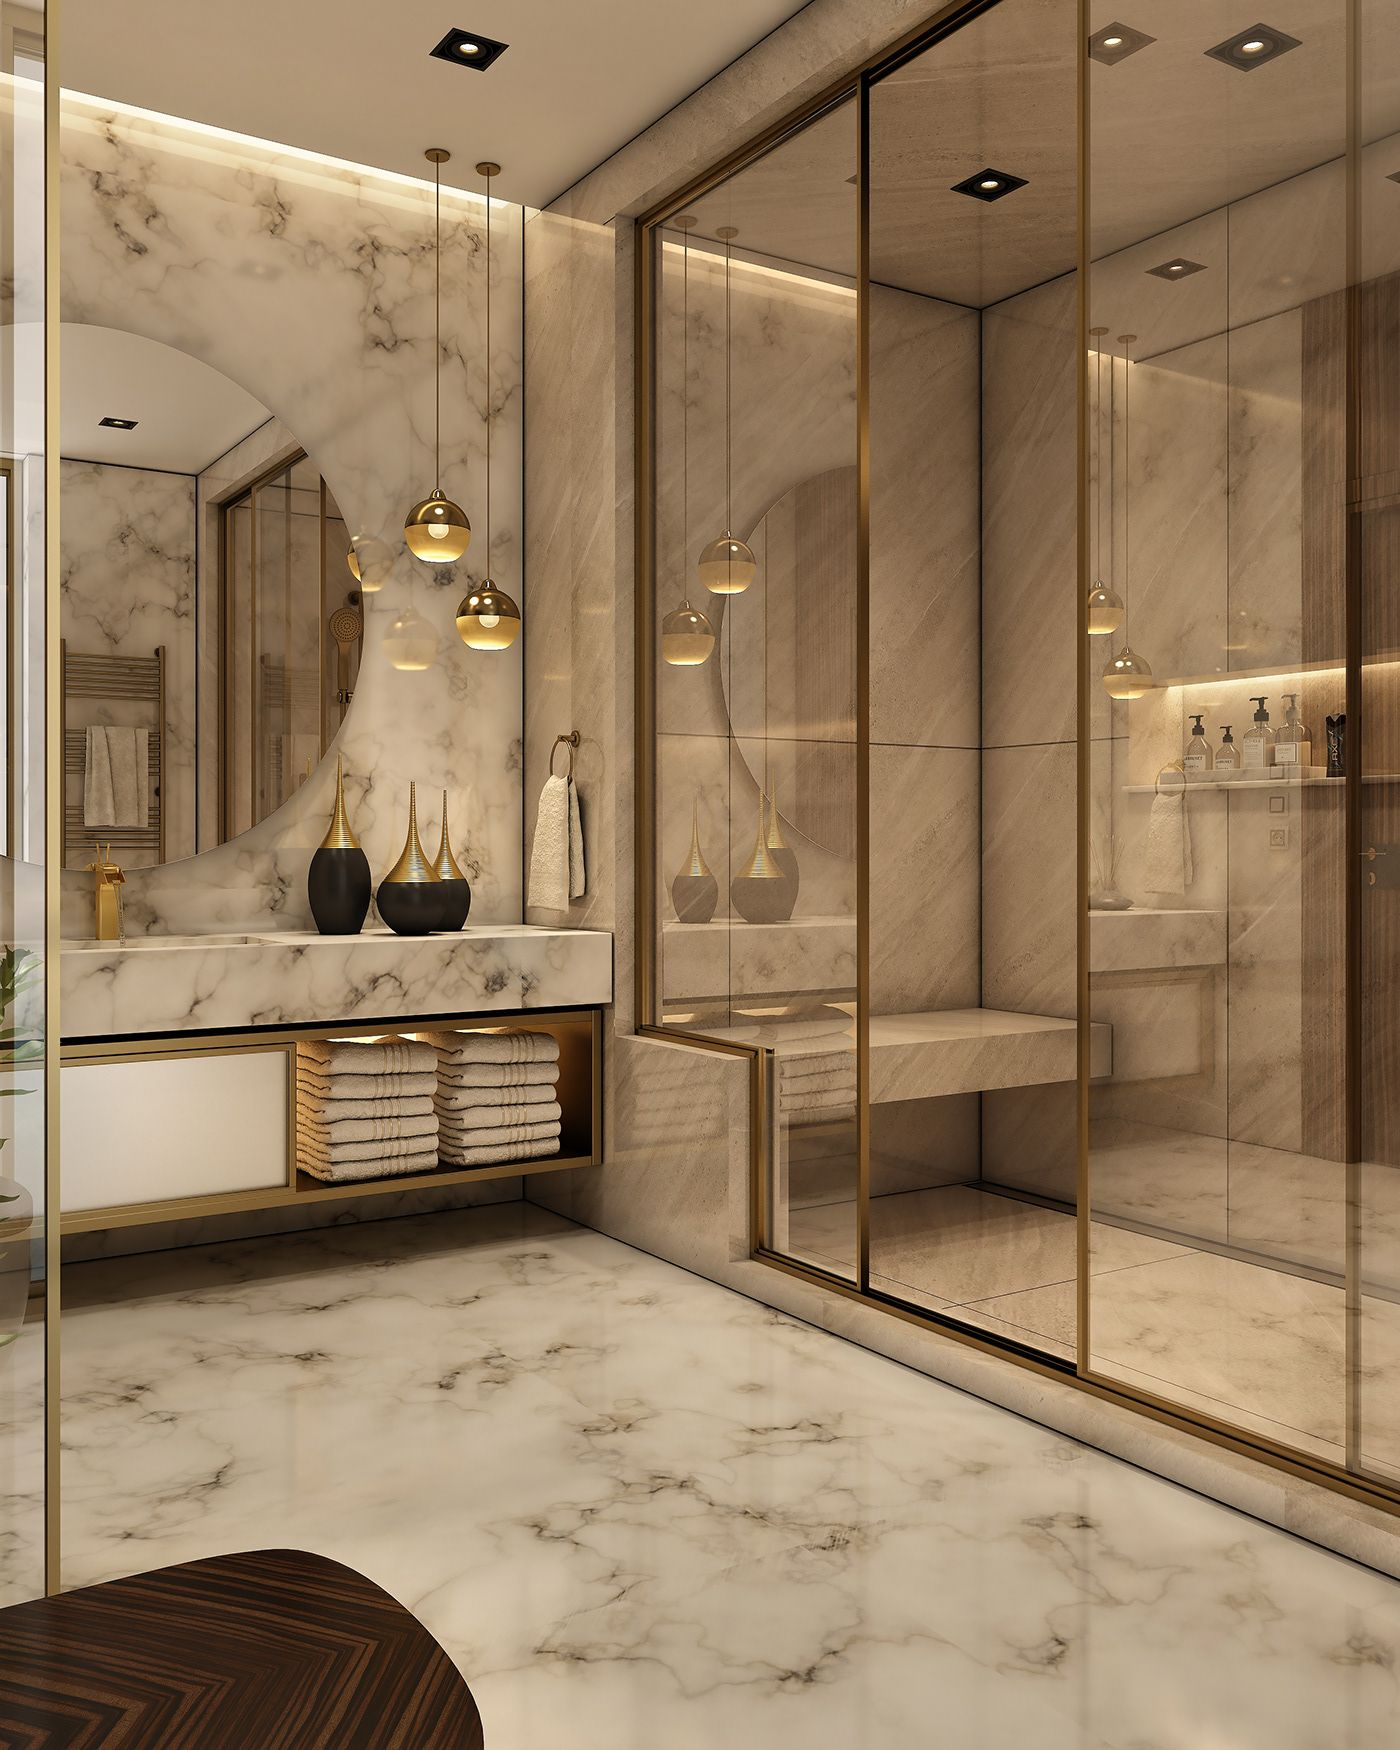 Luxurious Bathroom on Behance  Home in 2019  Home Decor